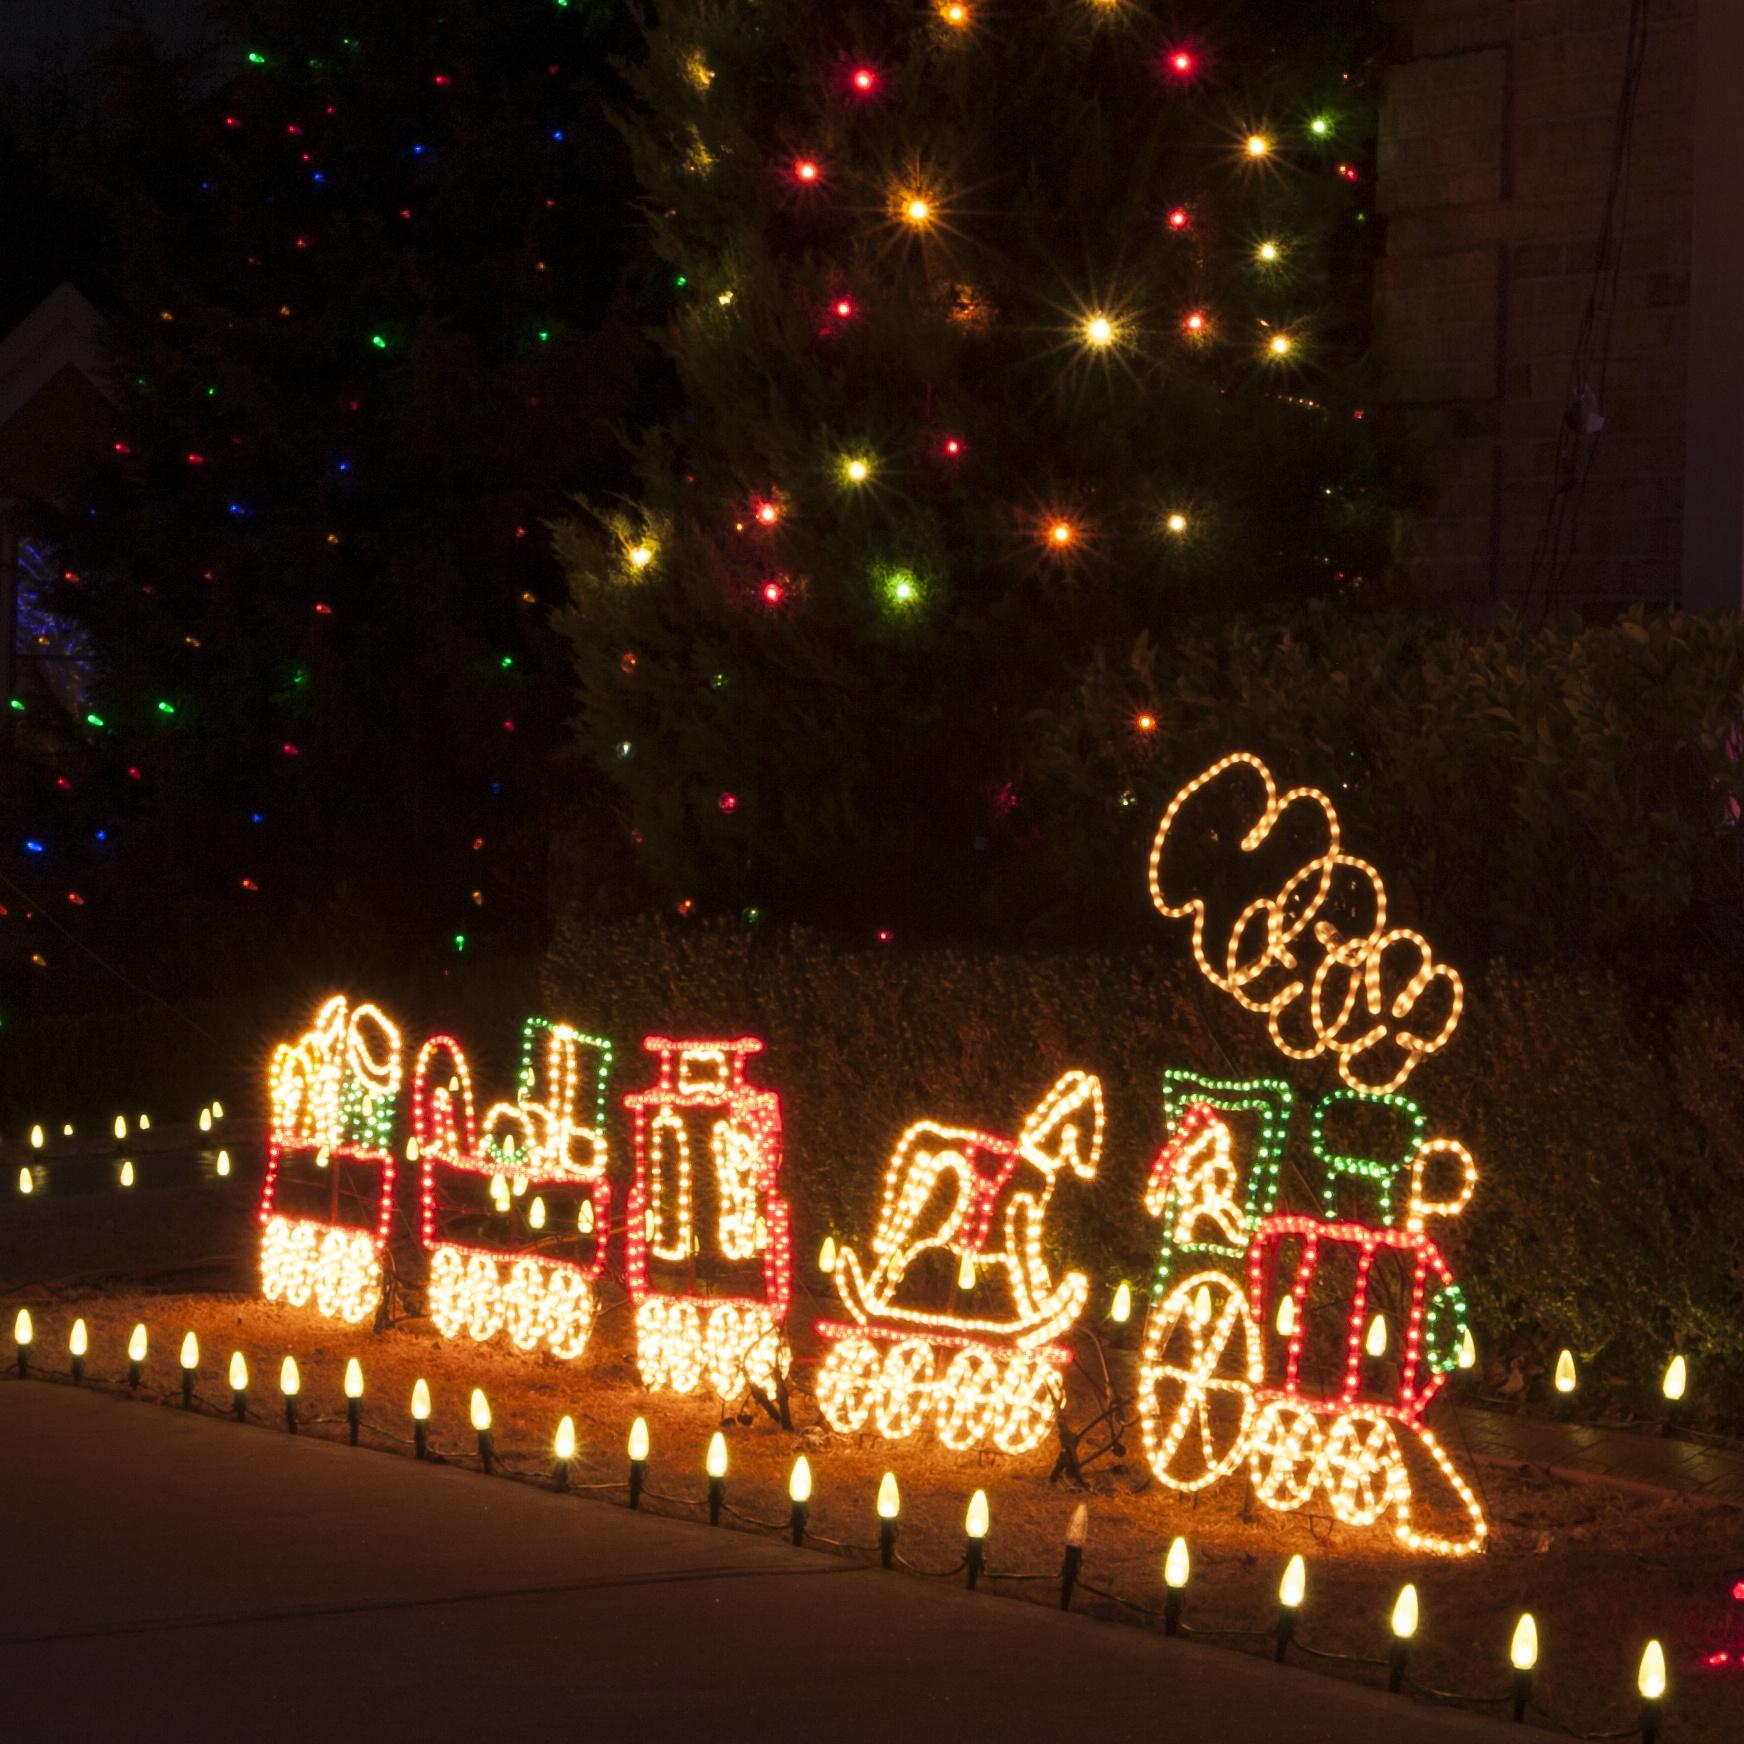 Outdoor Decoration - 17' Rope Light Train